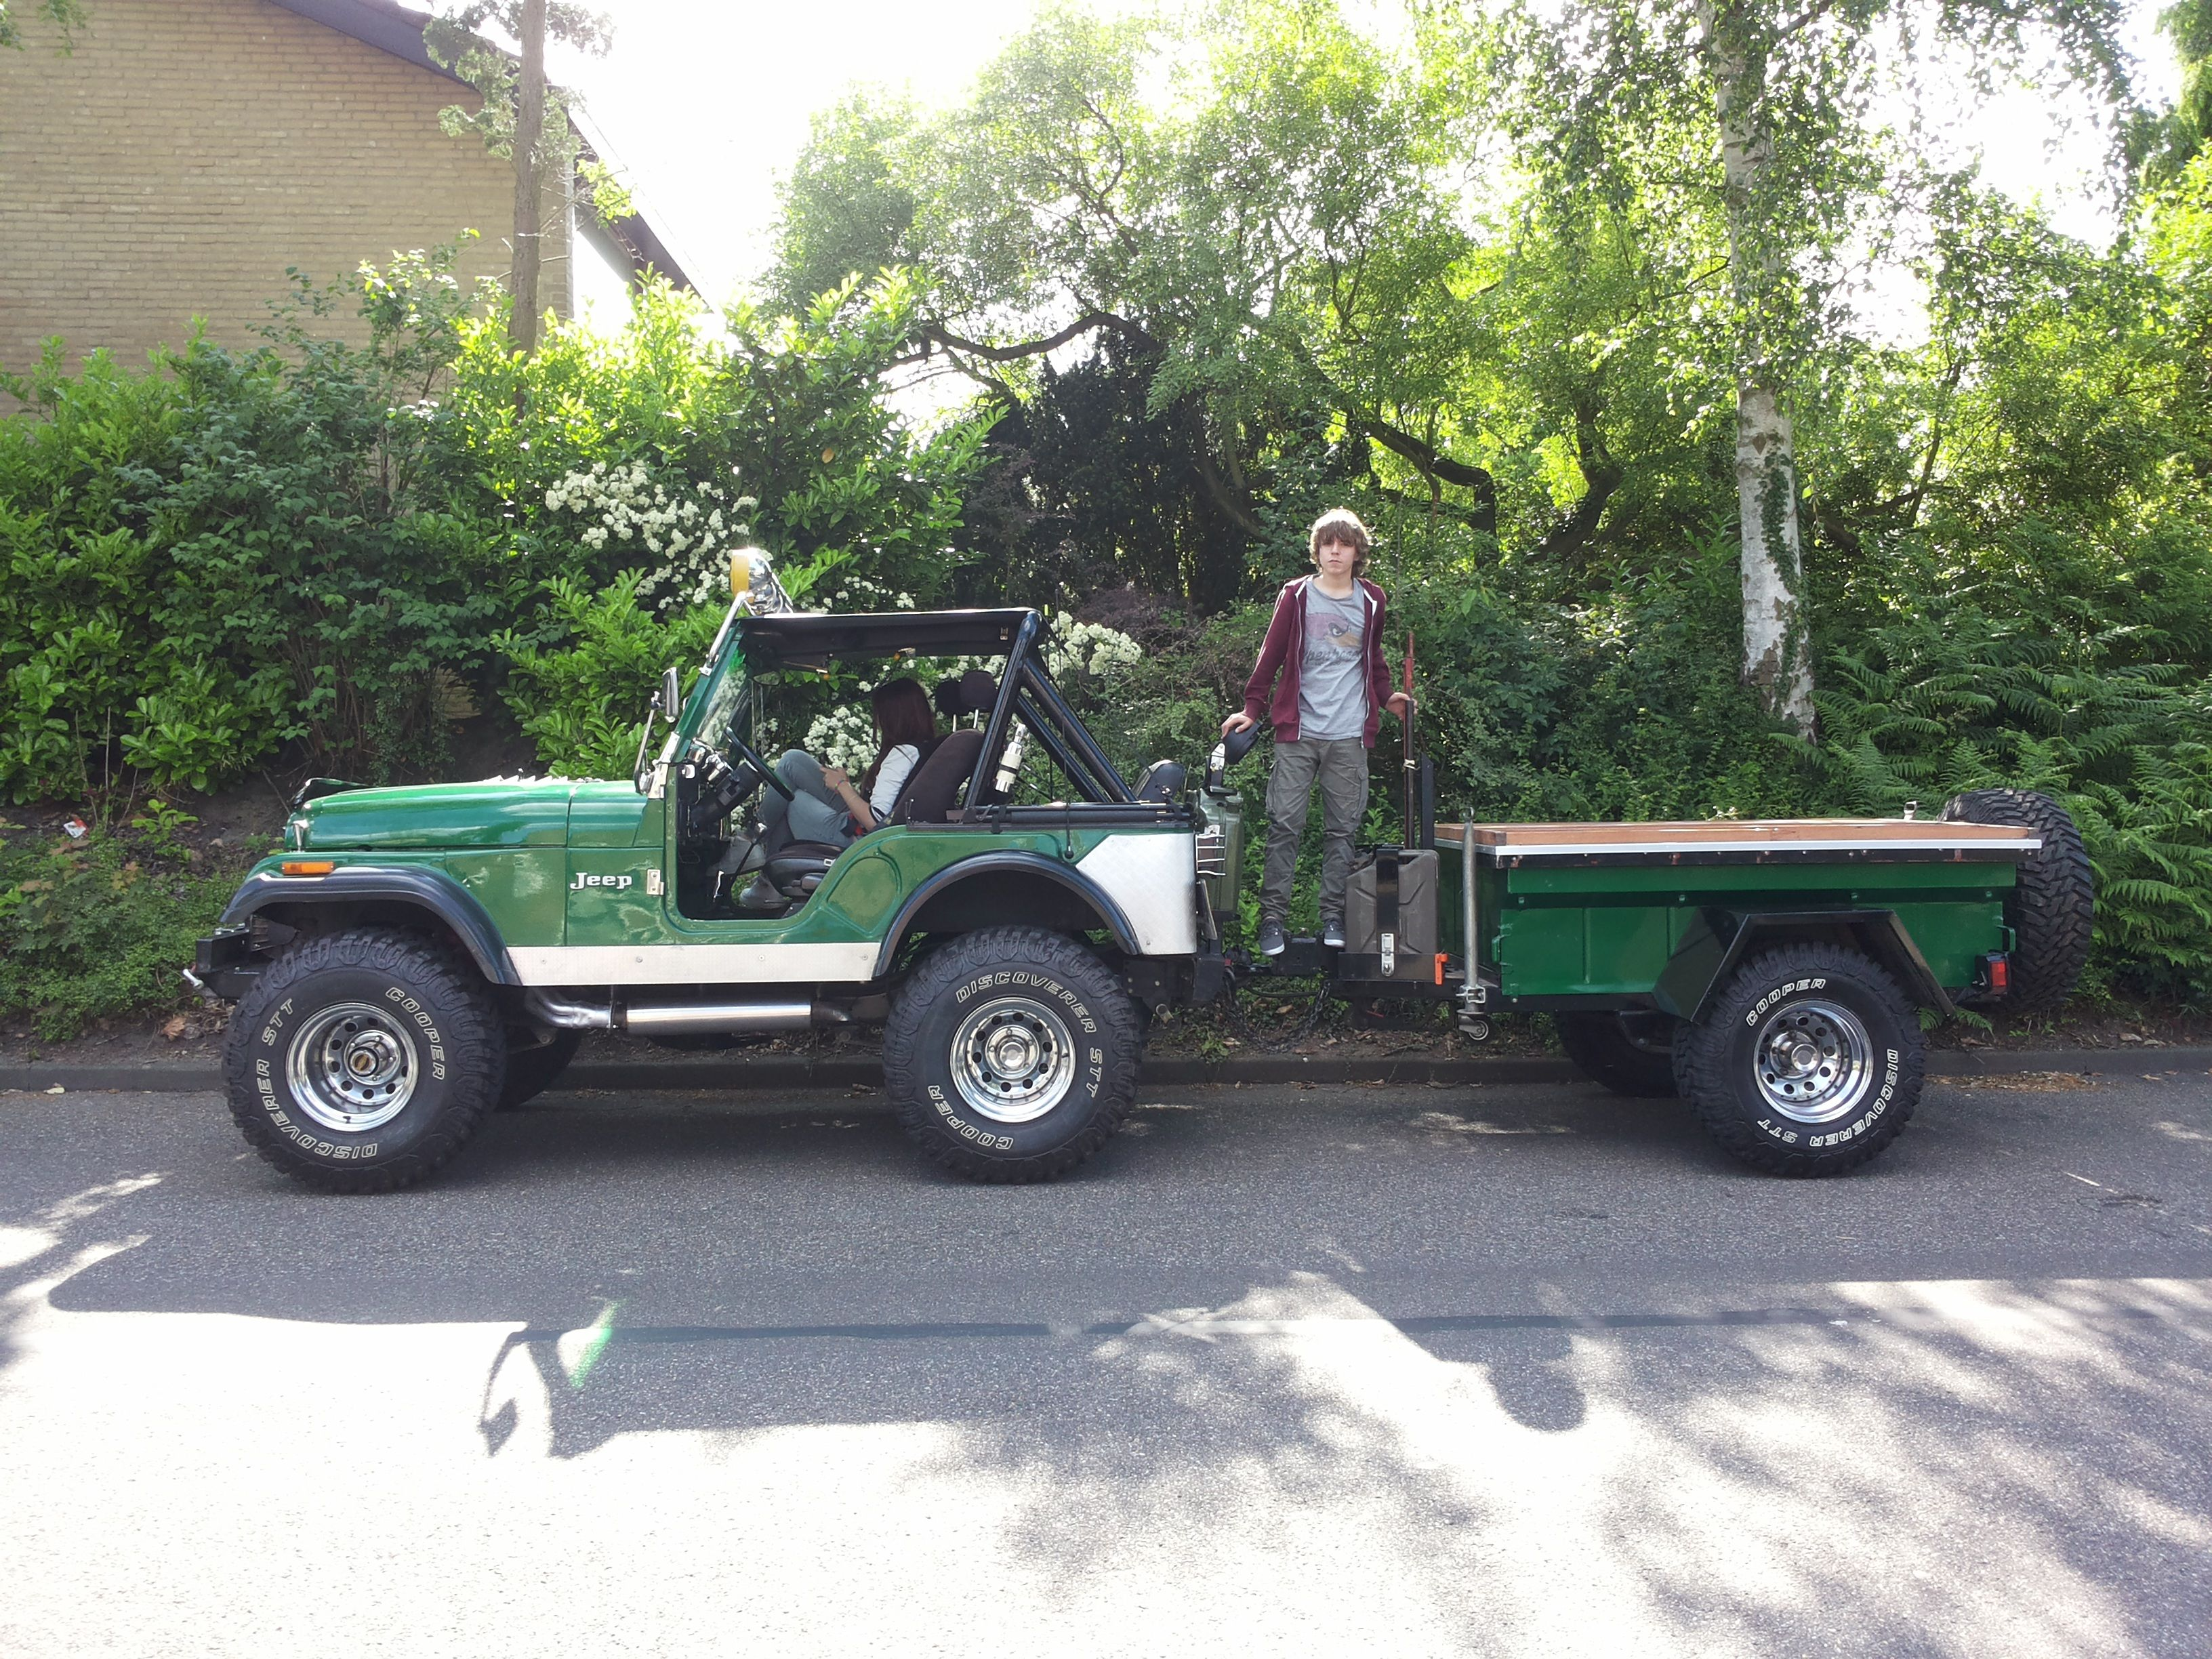 My Jeep CJ5 with my kids! | JEEP ME | Pinterest | Jeeps, Jeep truck ...